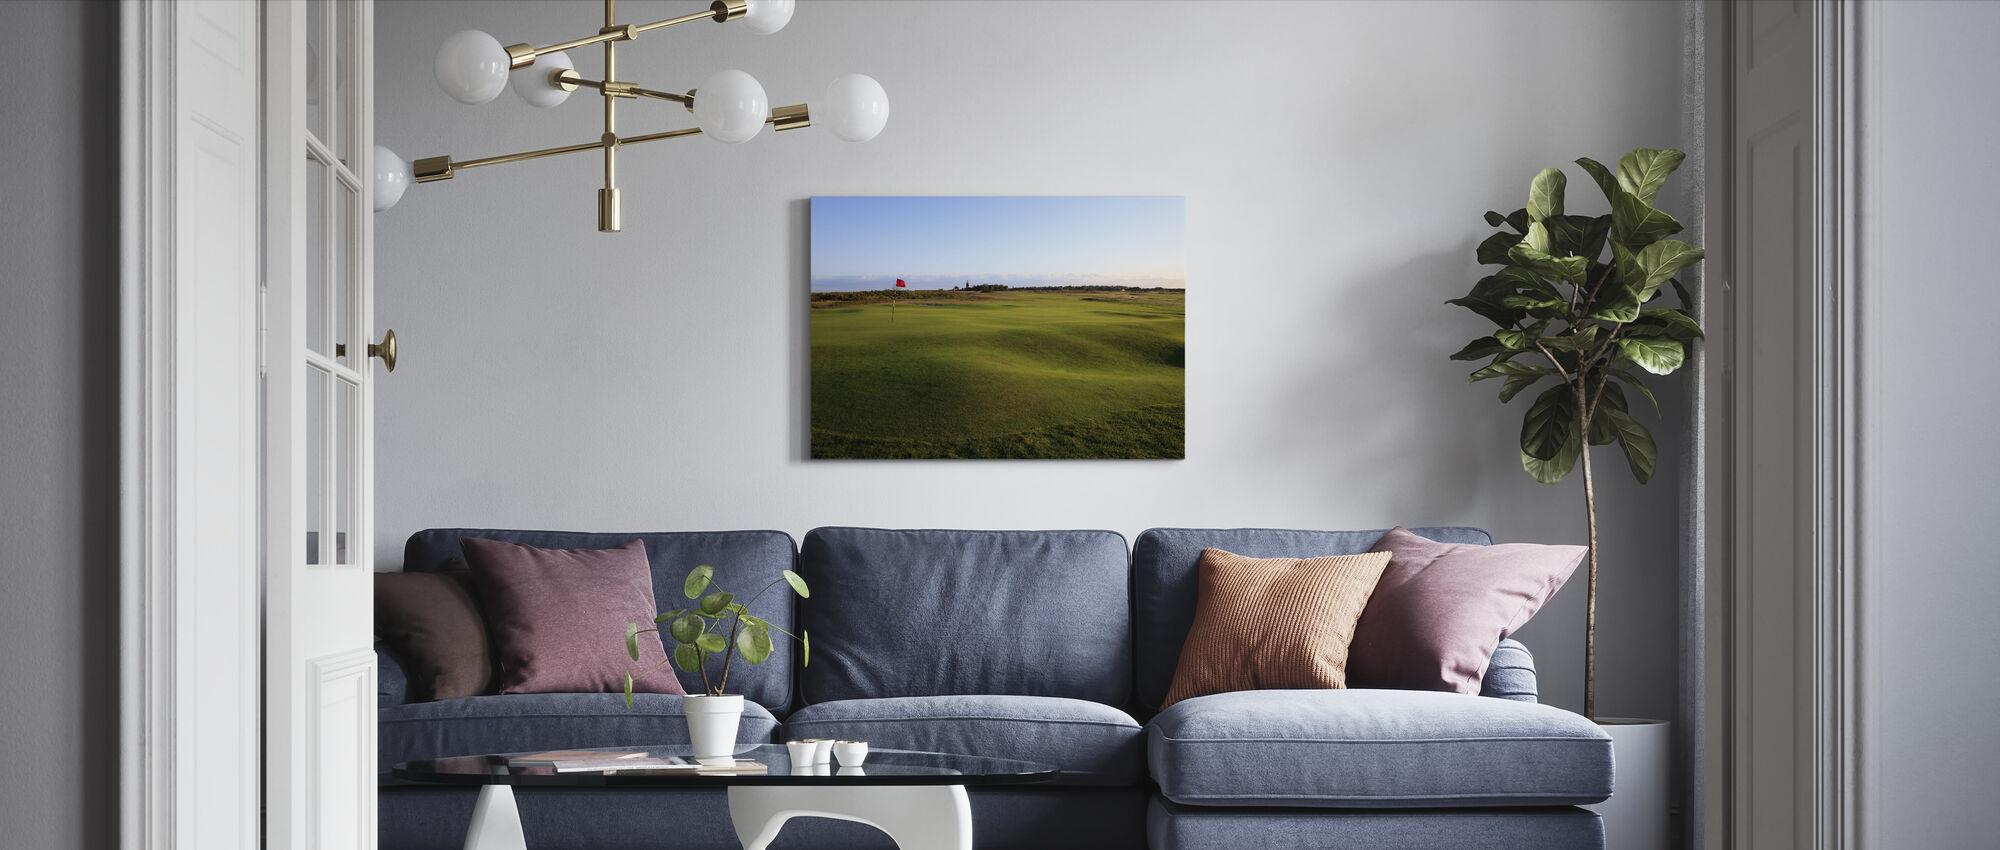 Golfbaan in Falsterbo, Zweden - Canvas print - Woonkamer